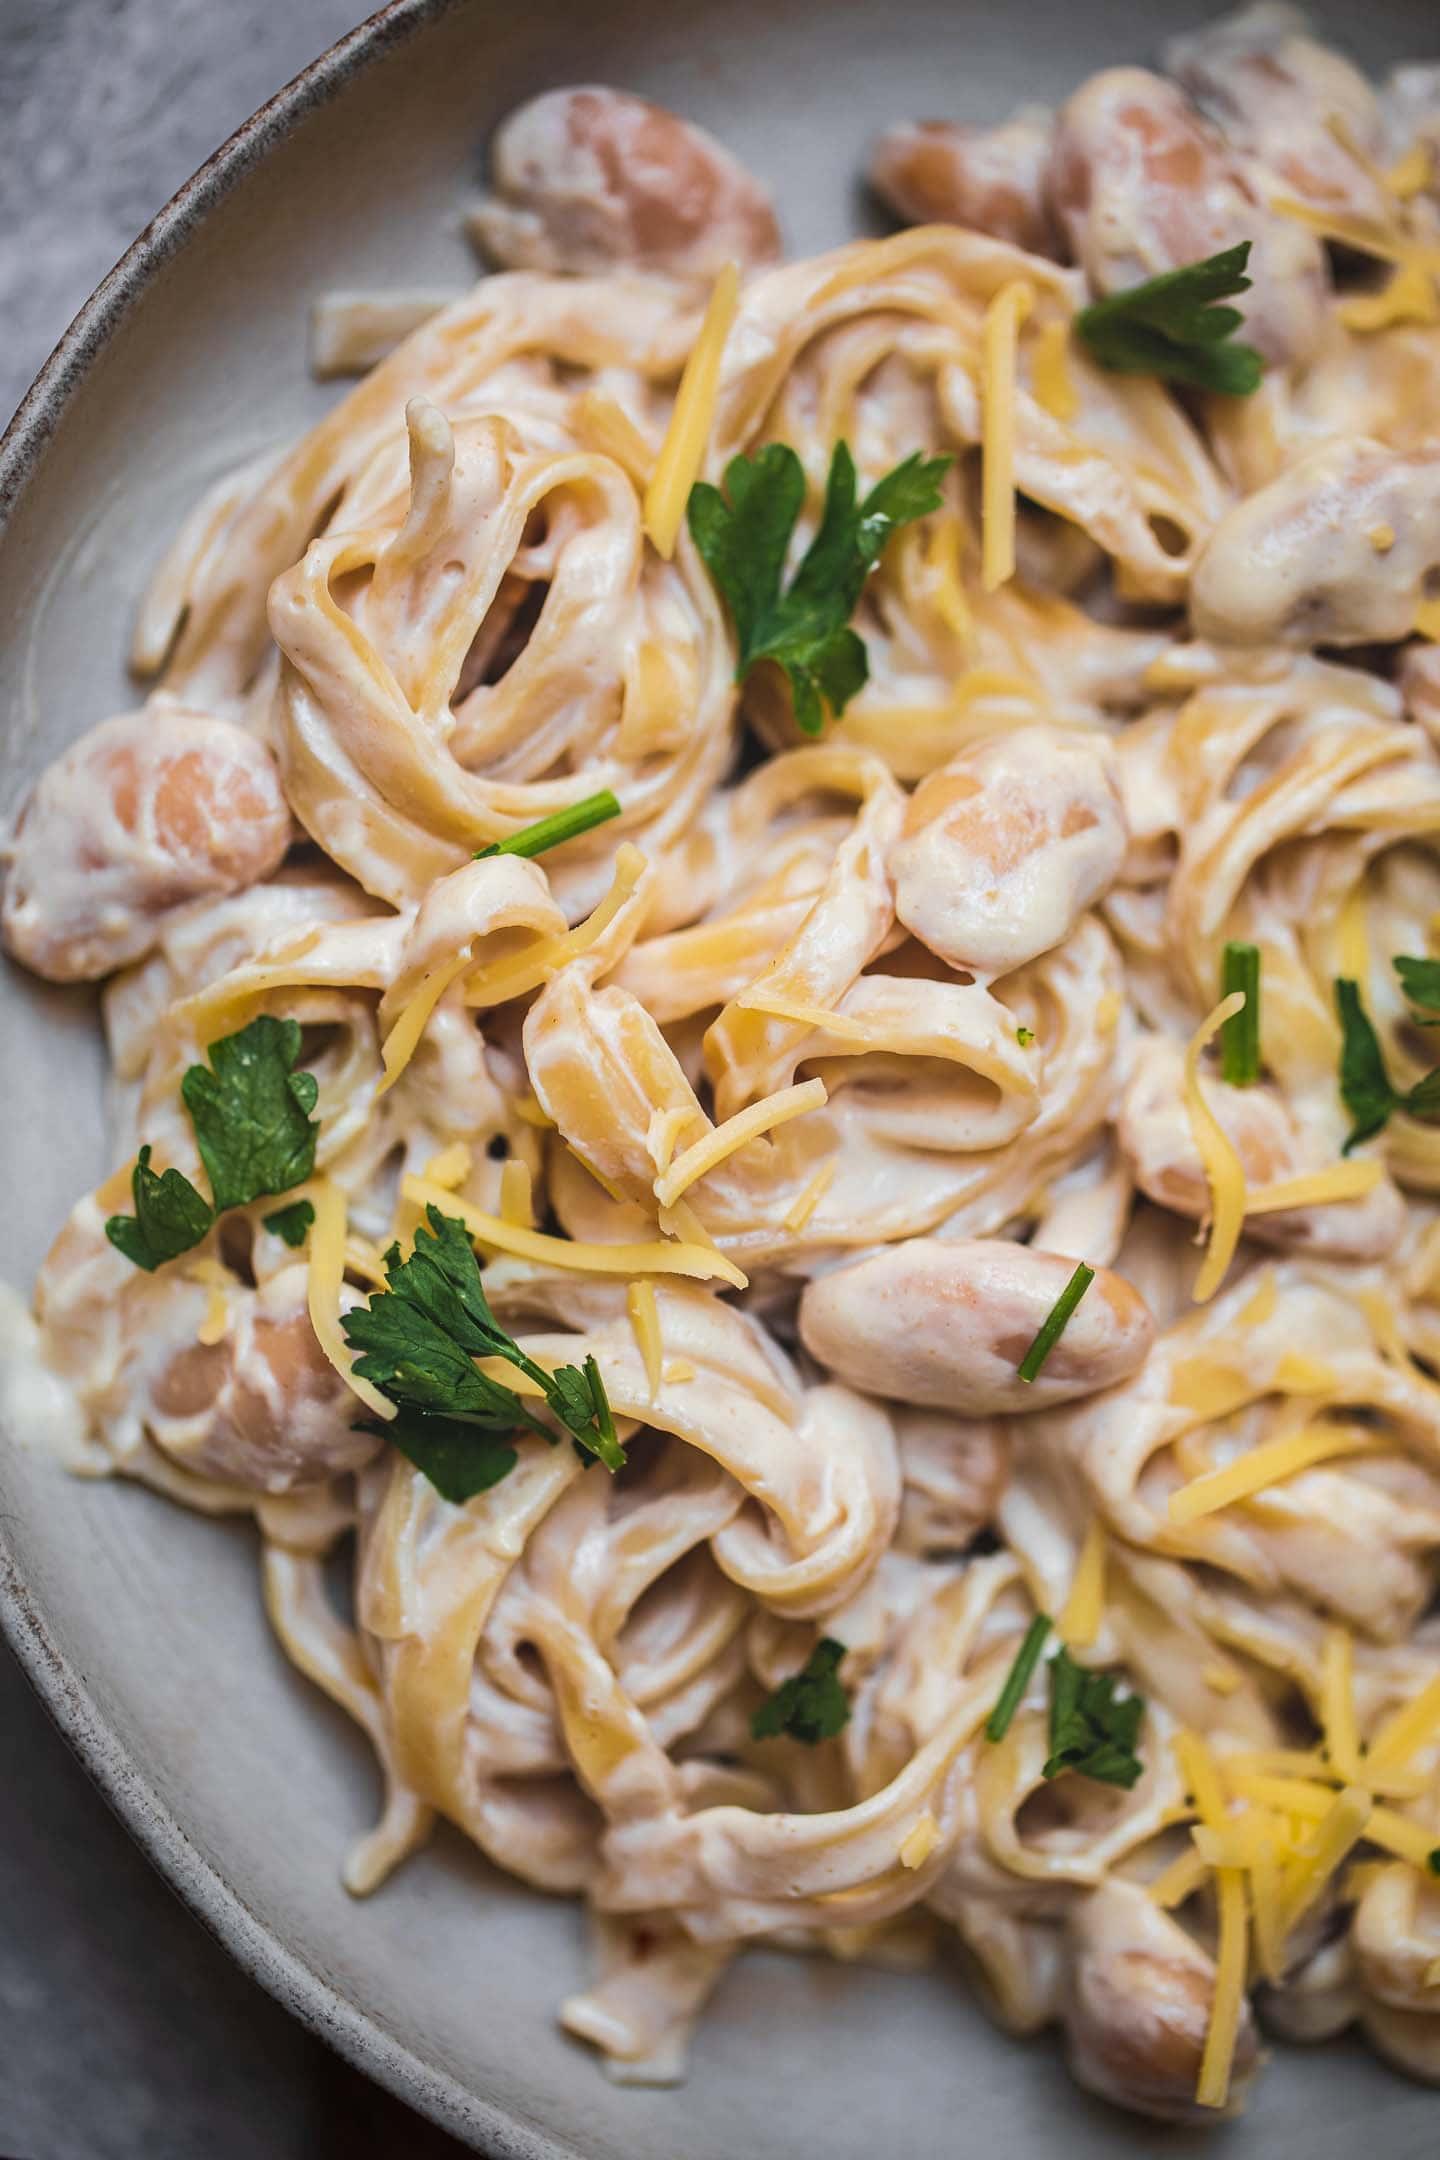 Plate of garlic pasta with vegan cheese